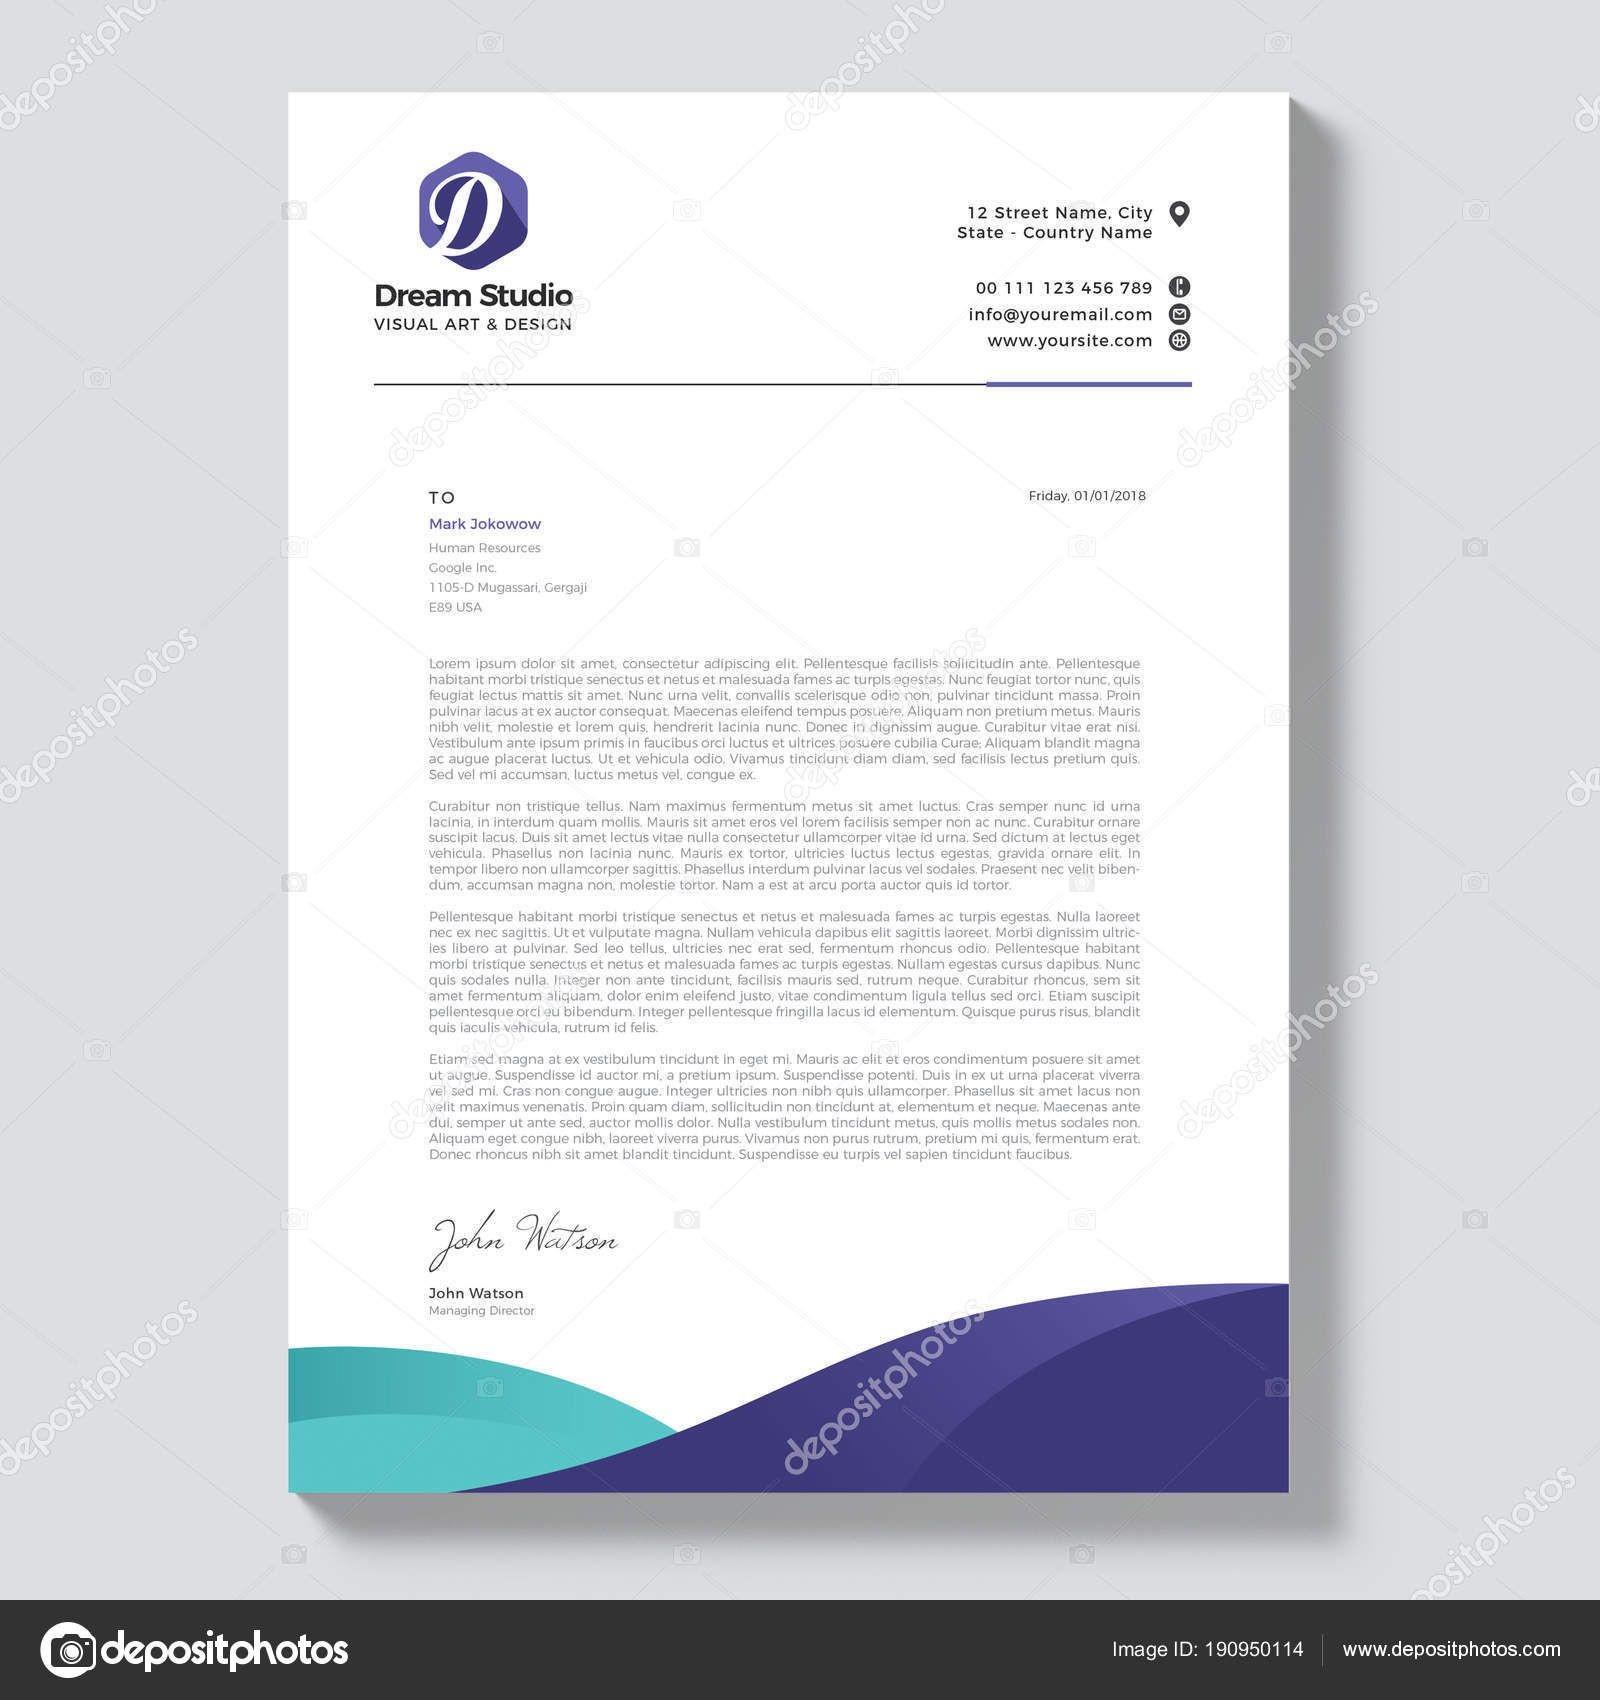 professional letterhead templates free download